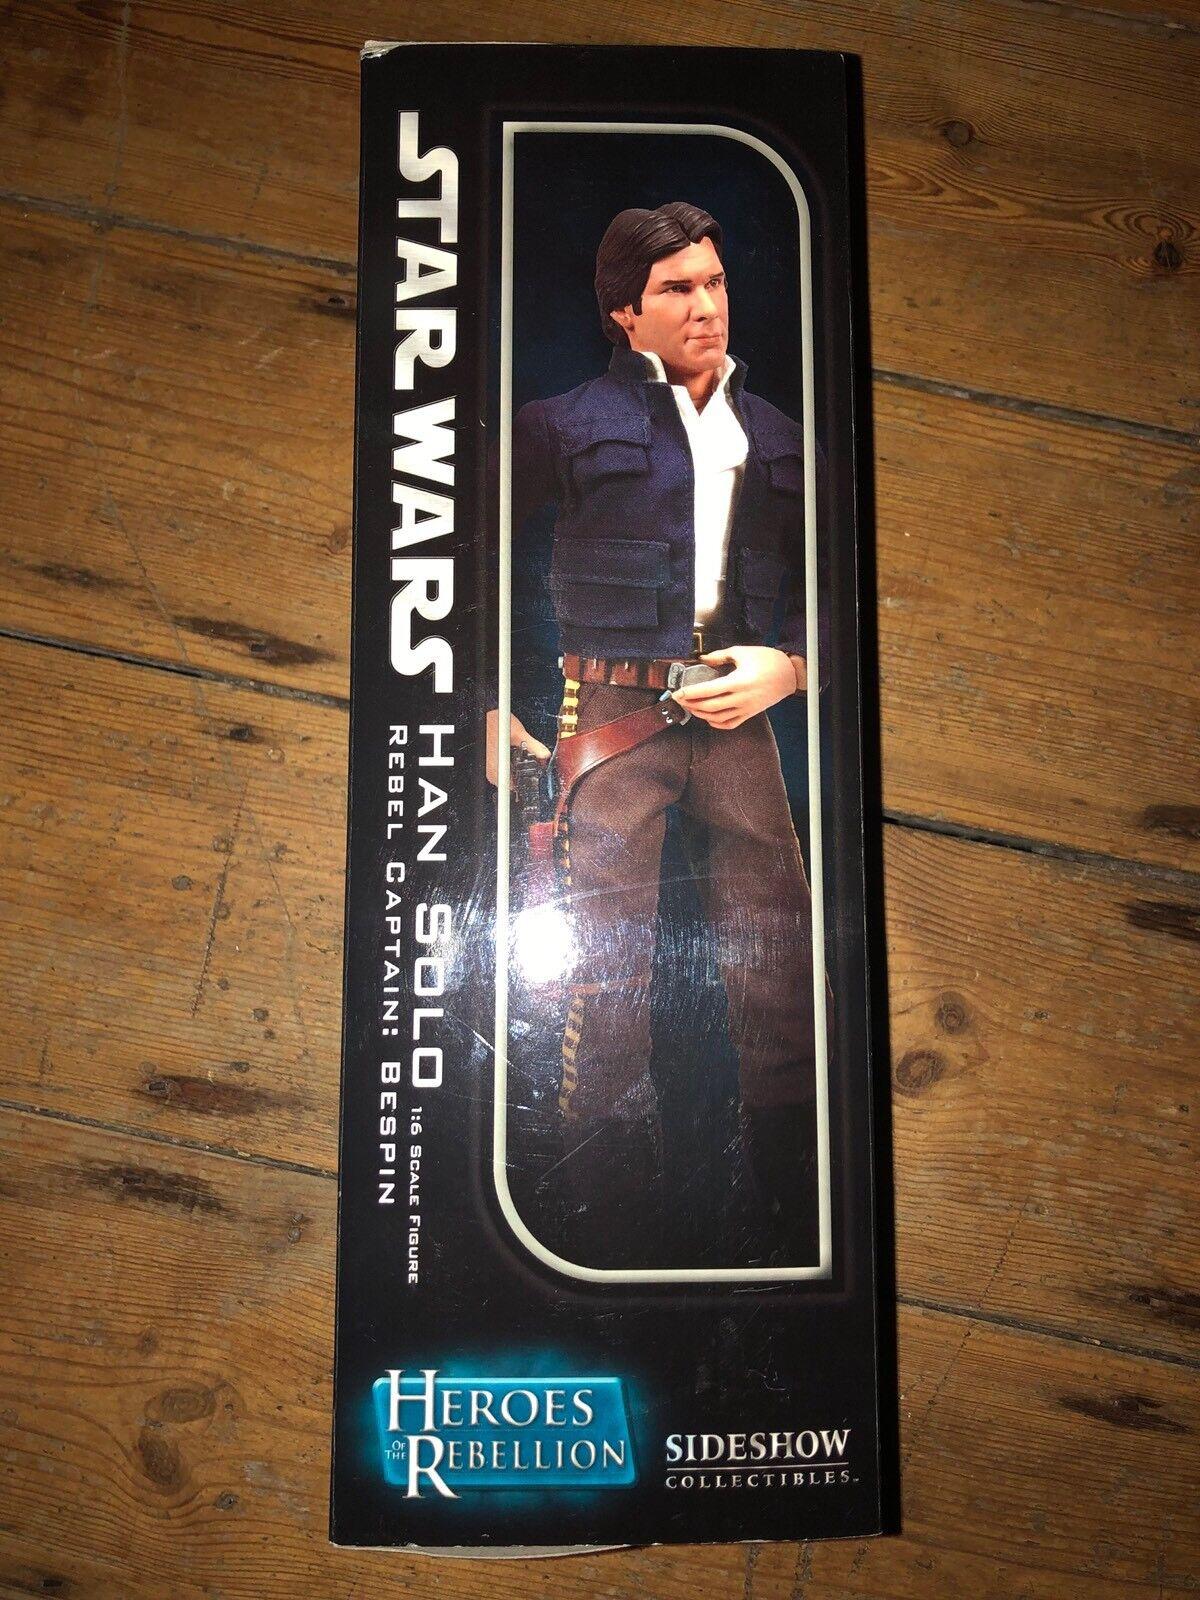 Sideshow Star Wars Heroes Of The Rebellion Han Solo Rebel Rebel Rebel Captain  Bespin C509 cbf763